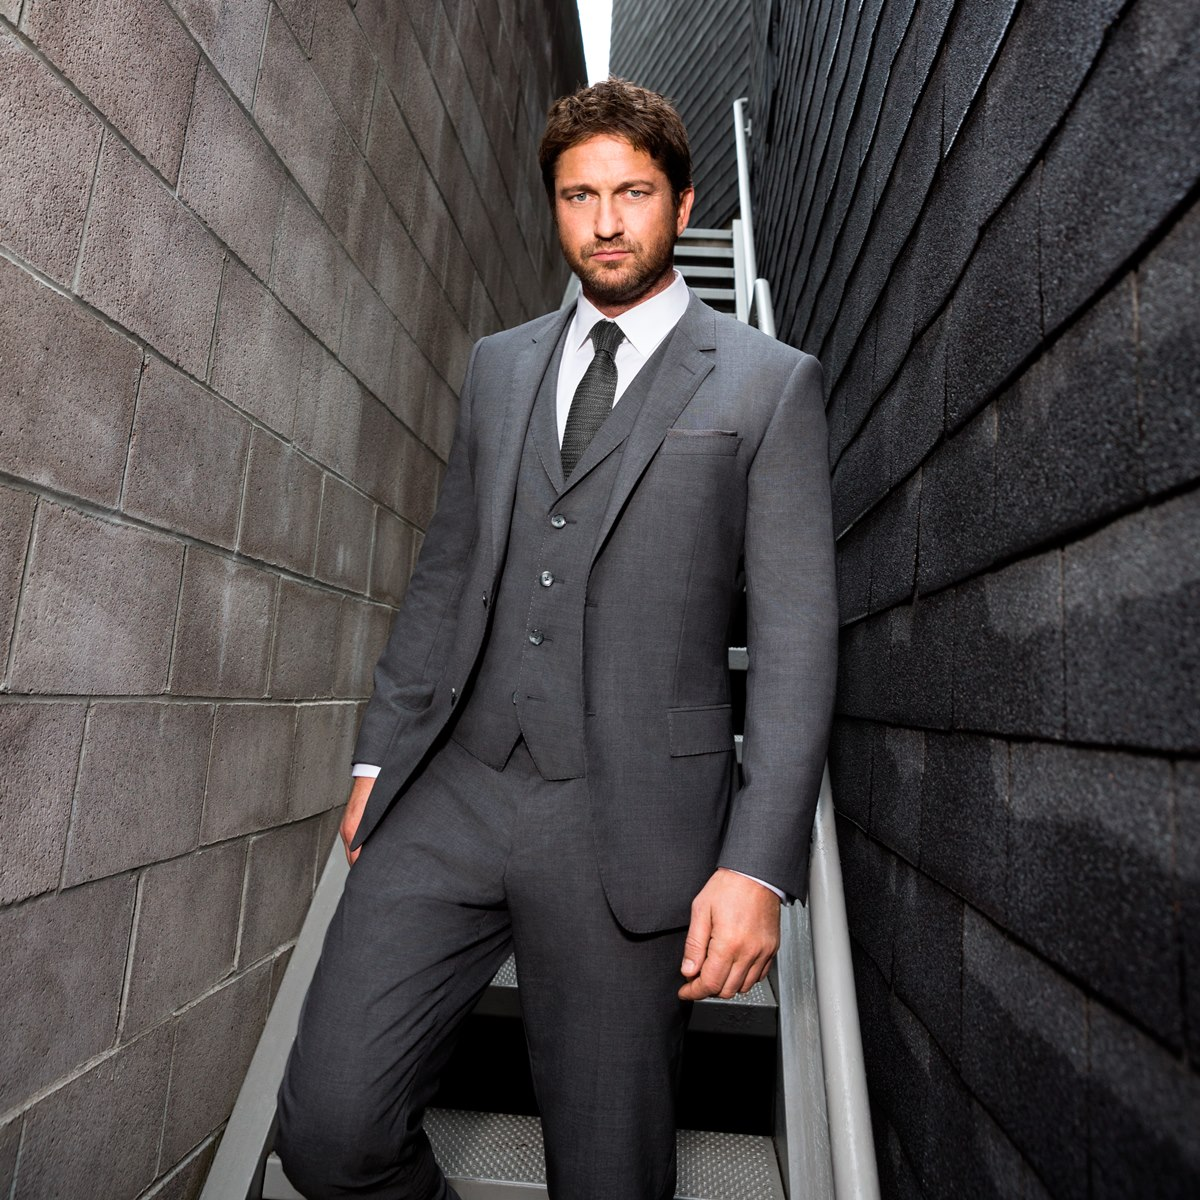 Fab Ties: 10 Men Who Wore a Tie & Suit the Best